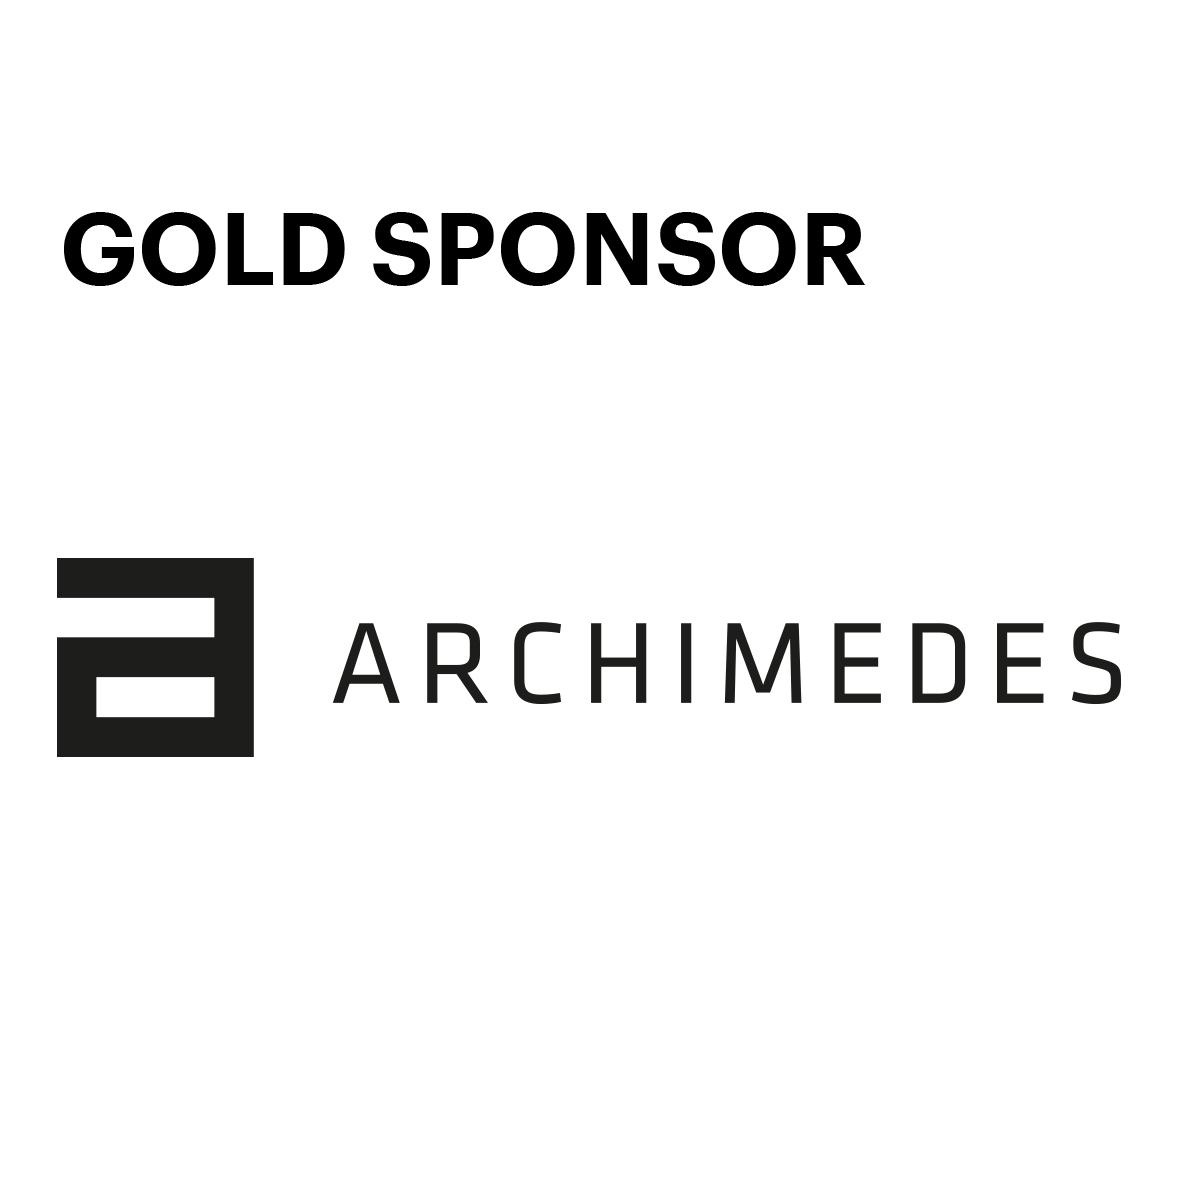 Archimedes logo